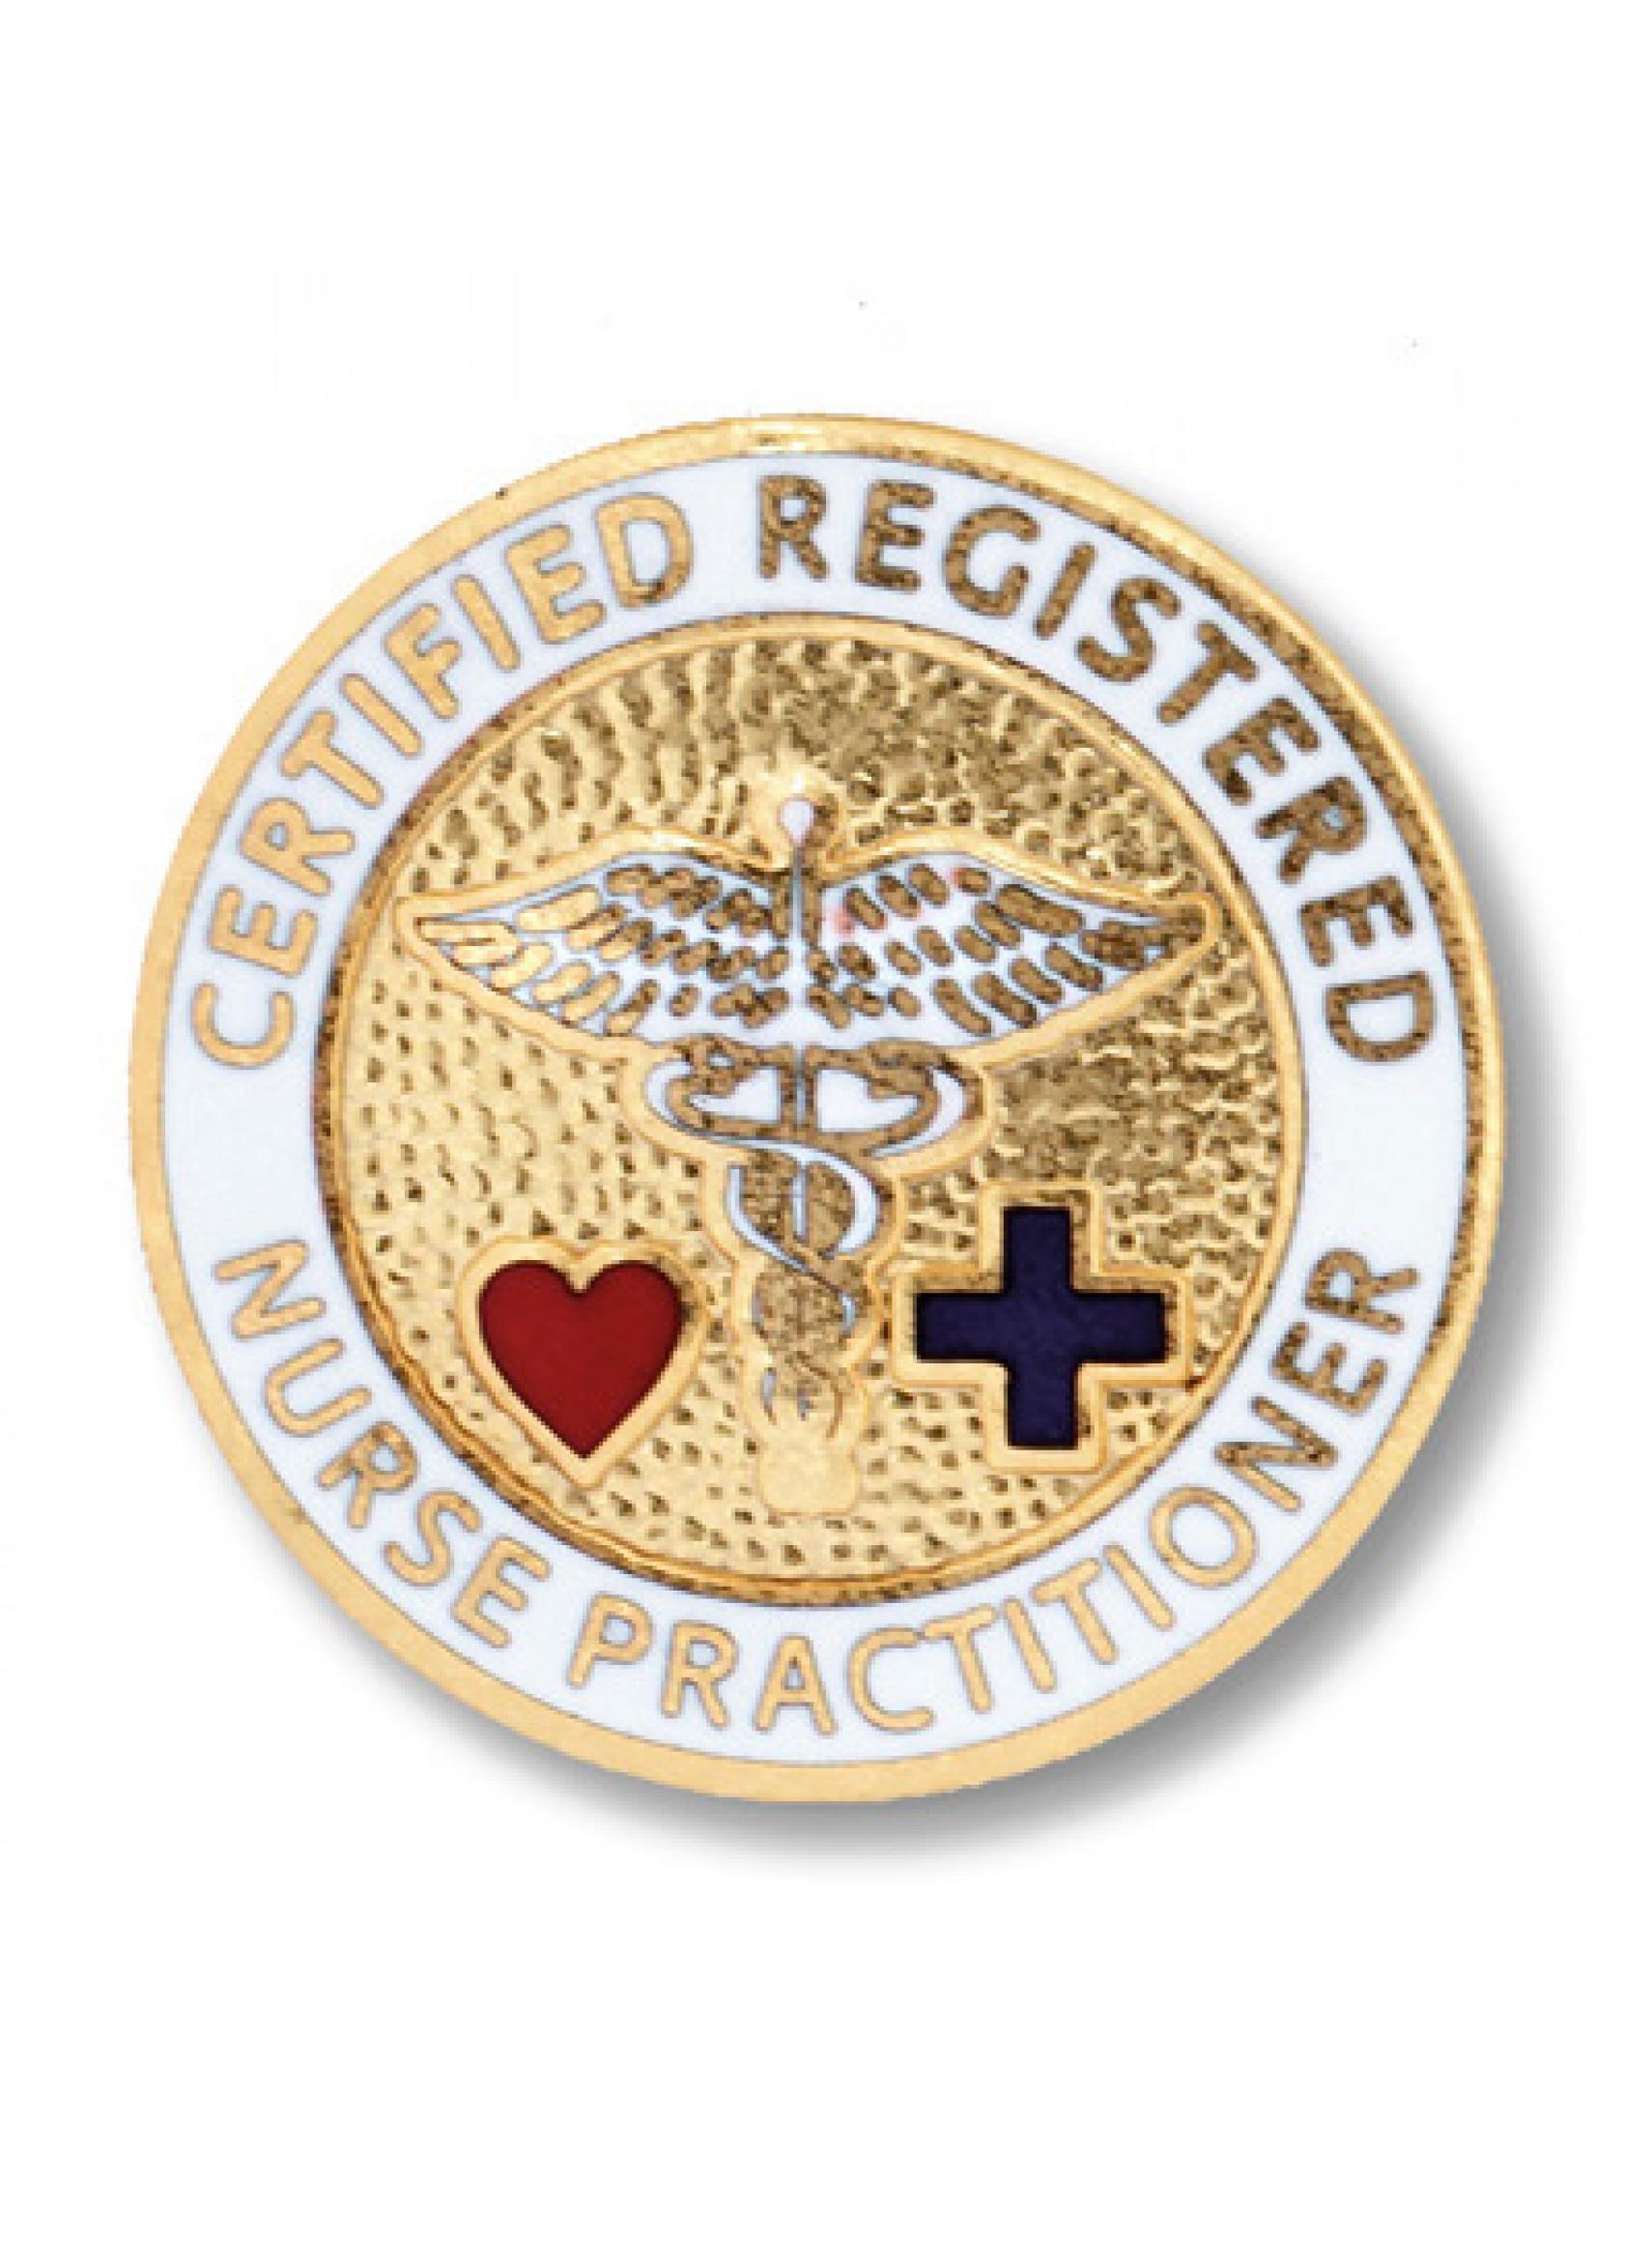 Prestige certified registered nurse practitioner pin 1009 prestige certified registered nurse practitioner pin 1009 biocorpaavc